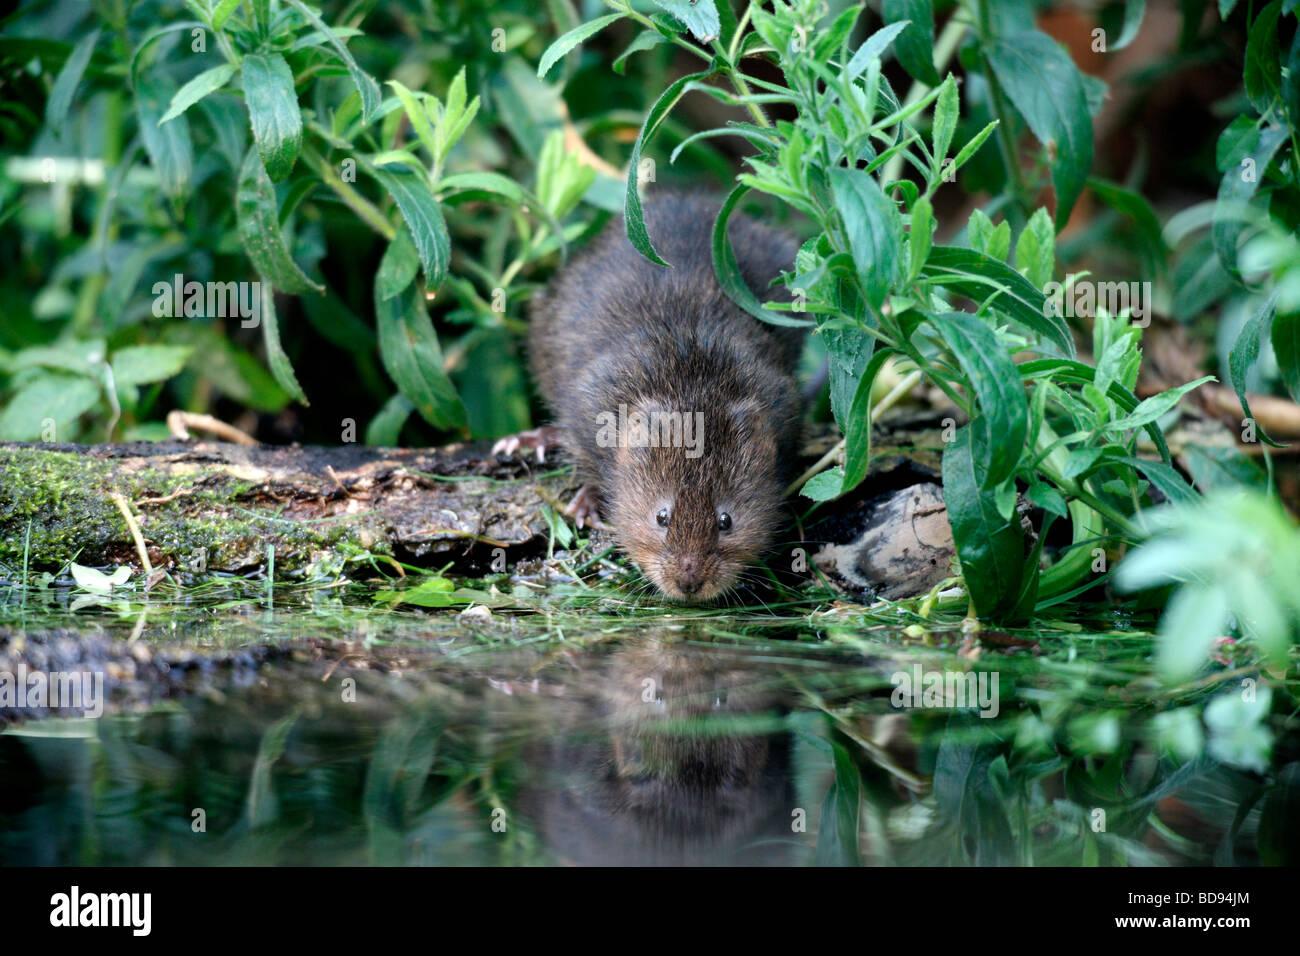 Water vole Arvicola terrestris Kent August 2009 - Stock Image